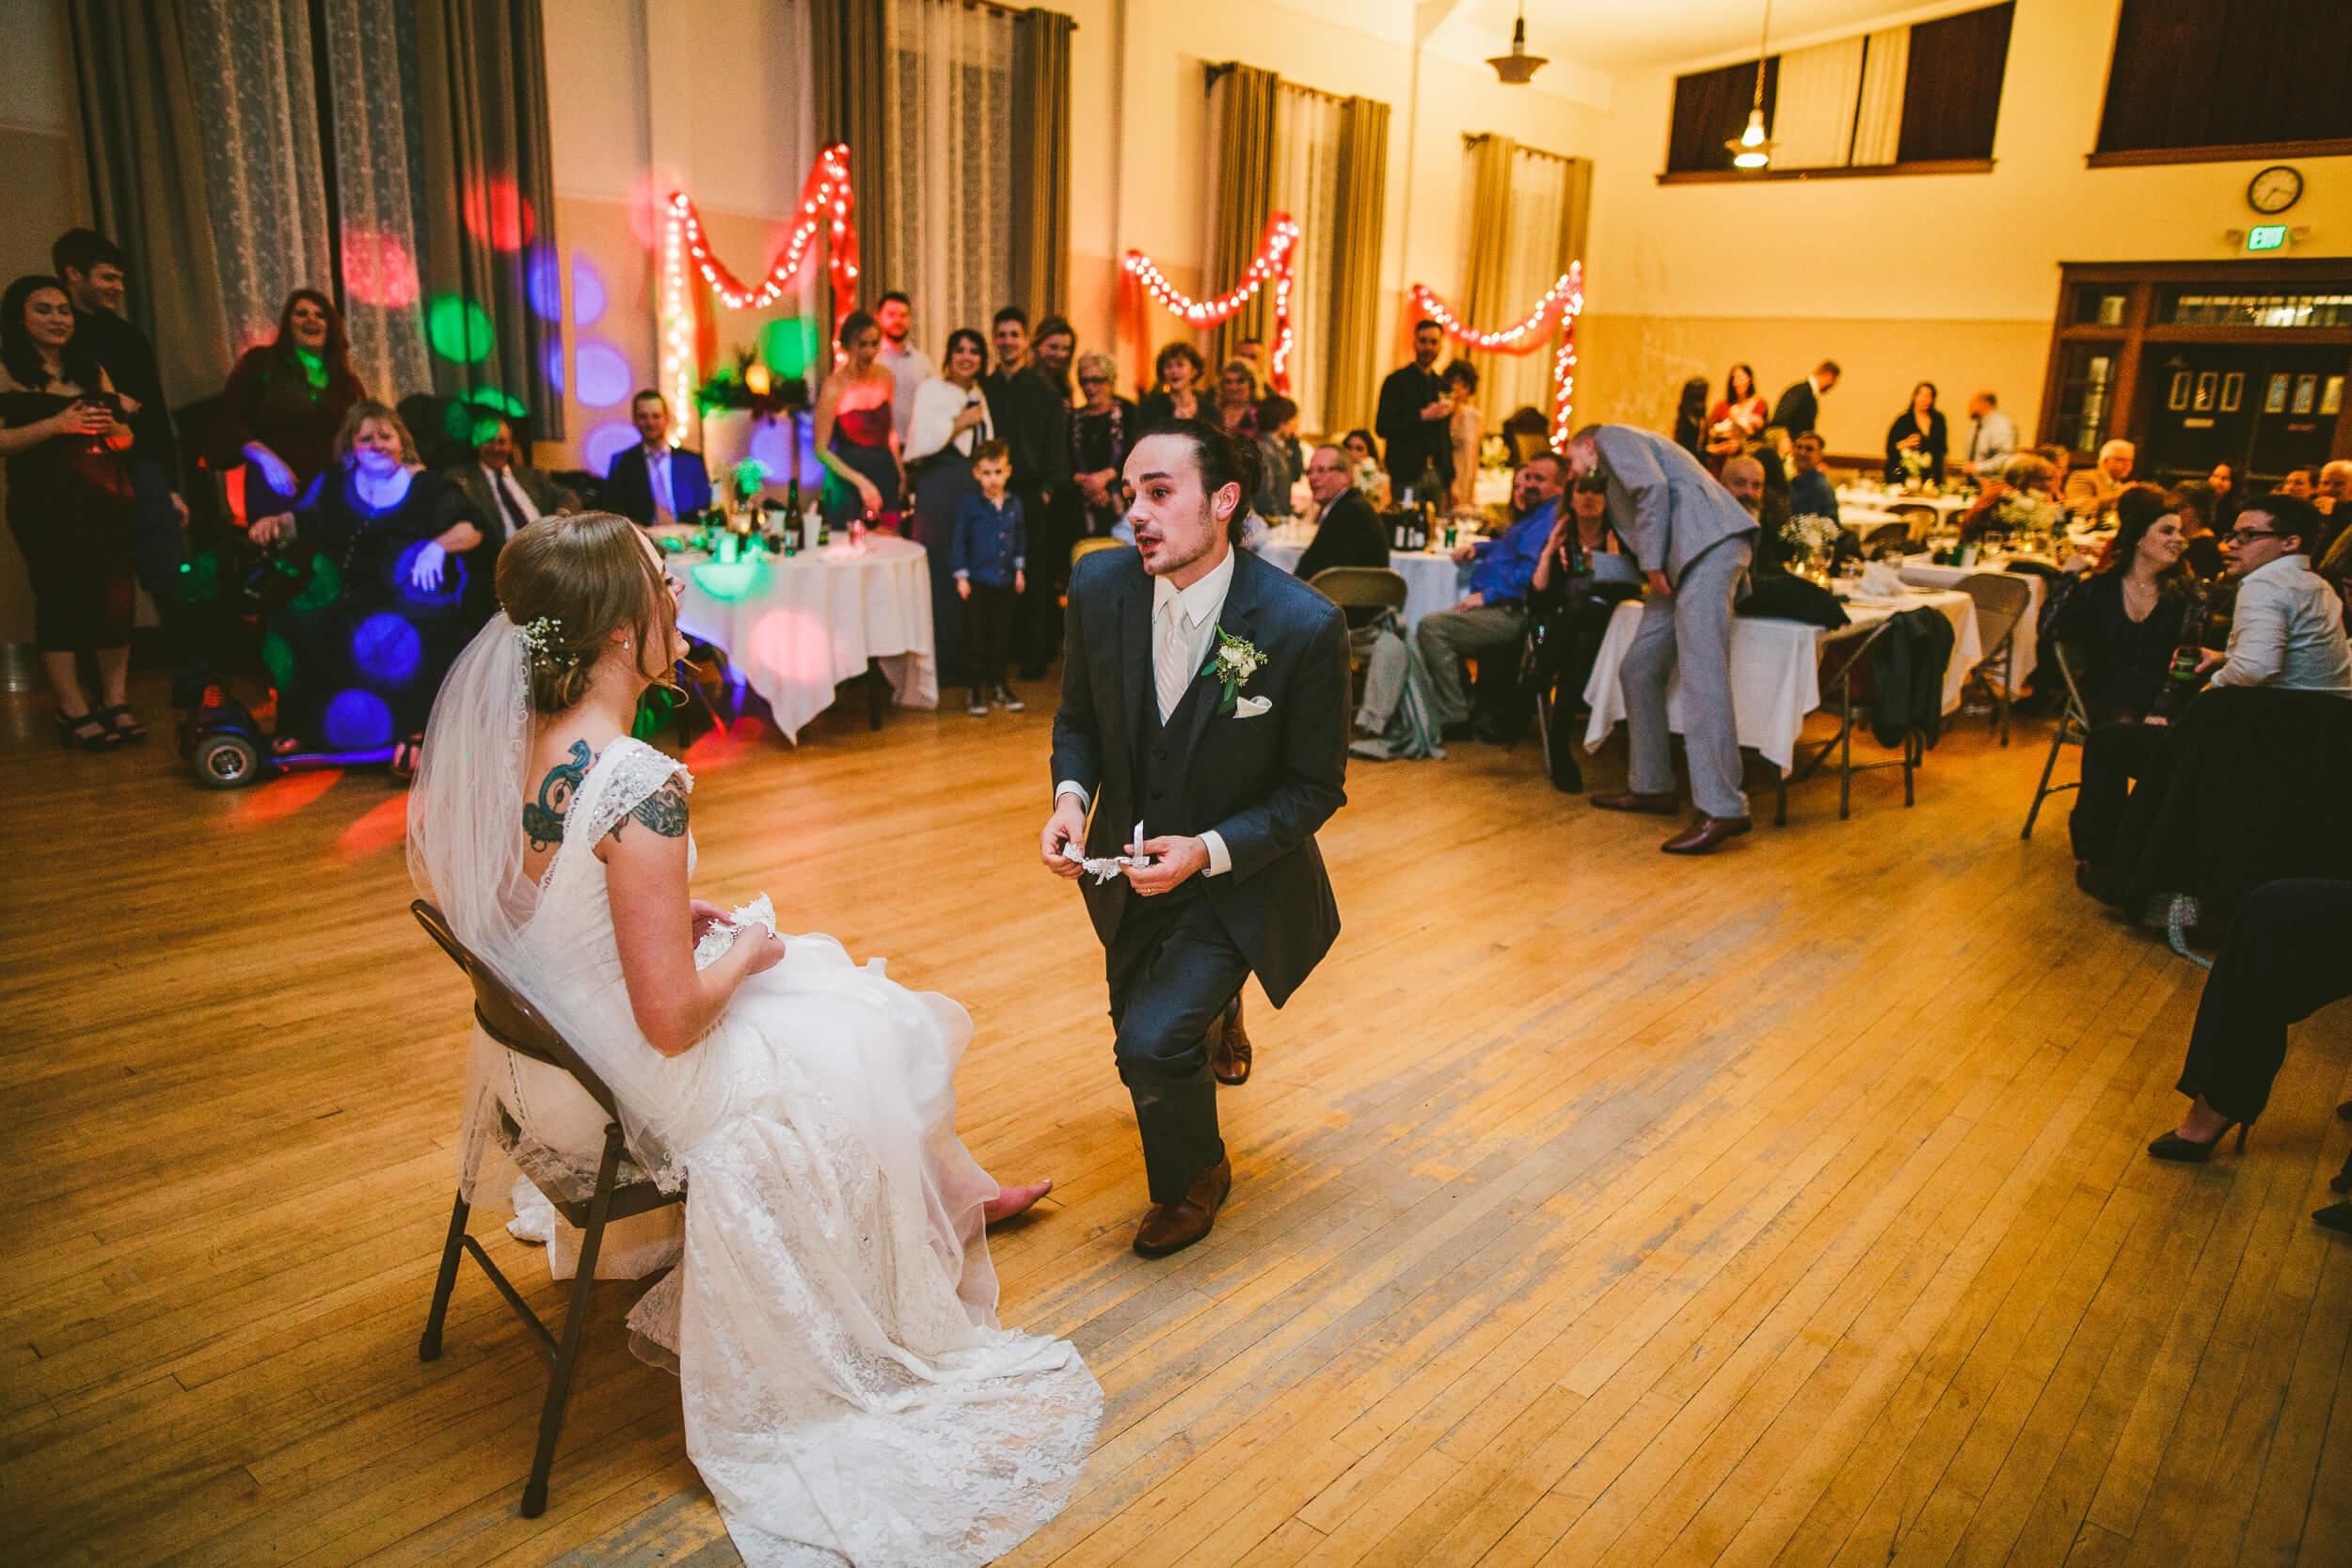 mukogawa winter wedding in spokane (336).jpg